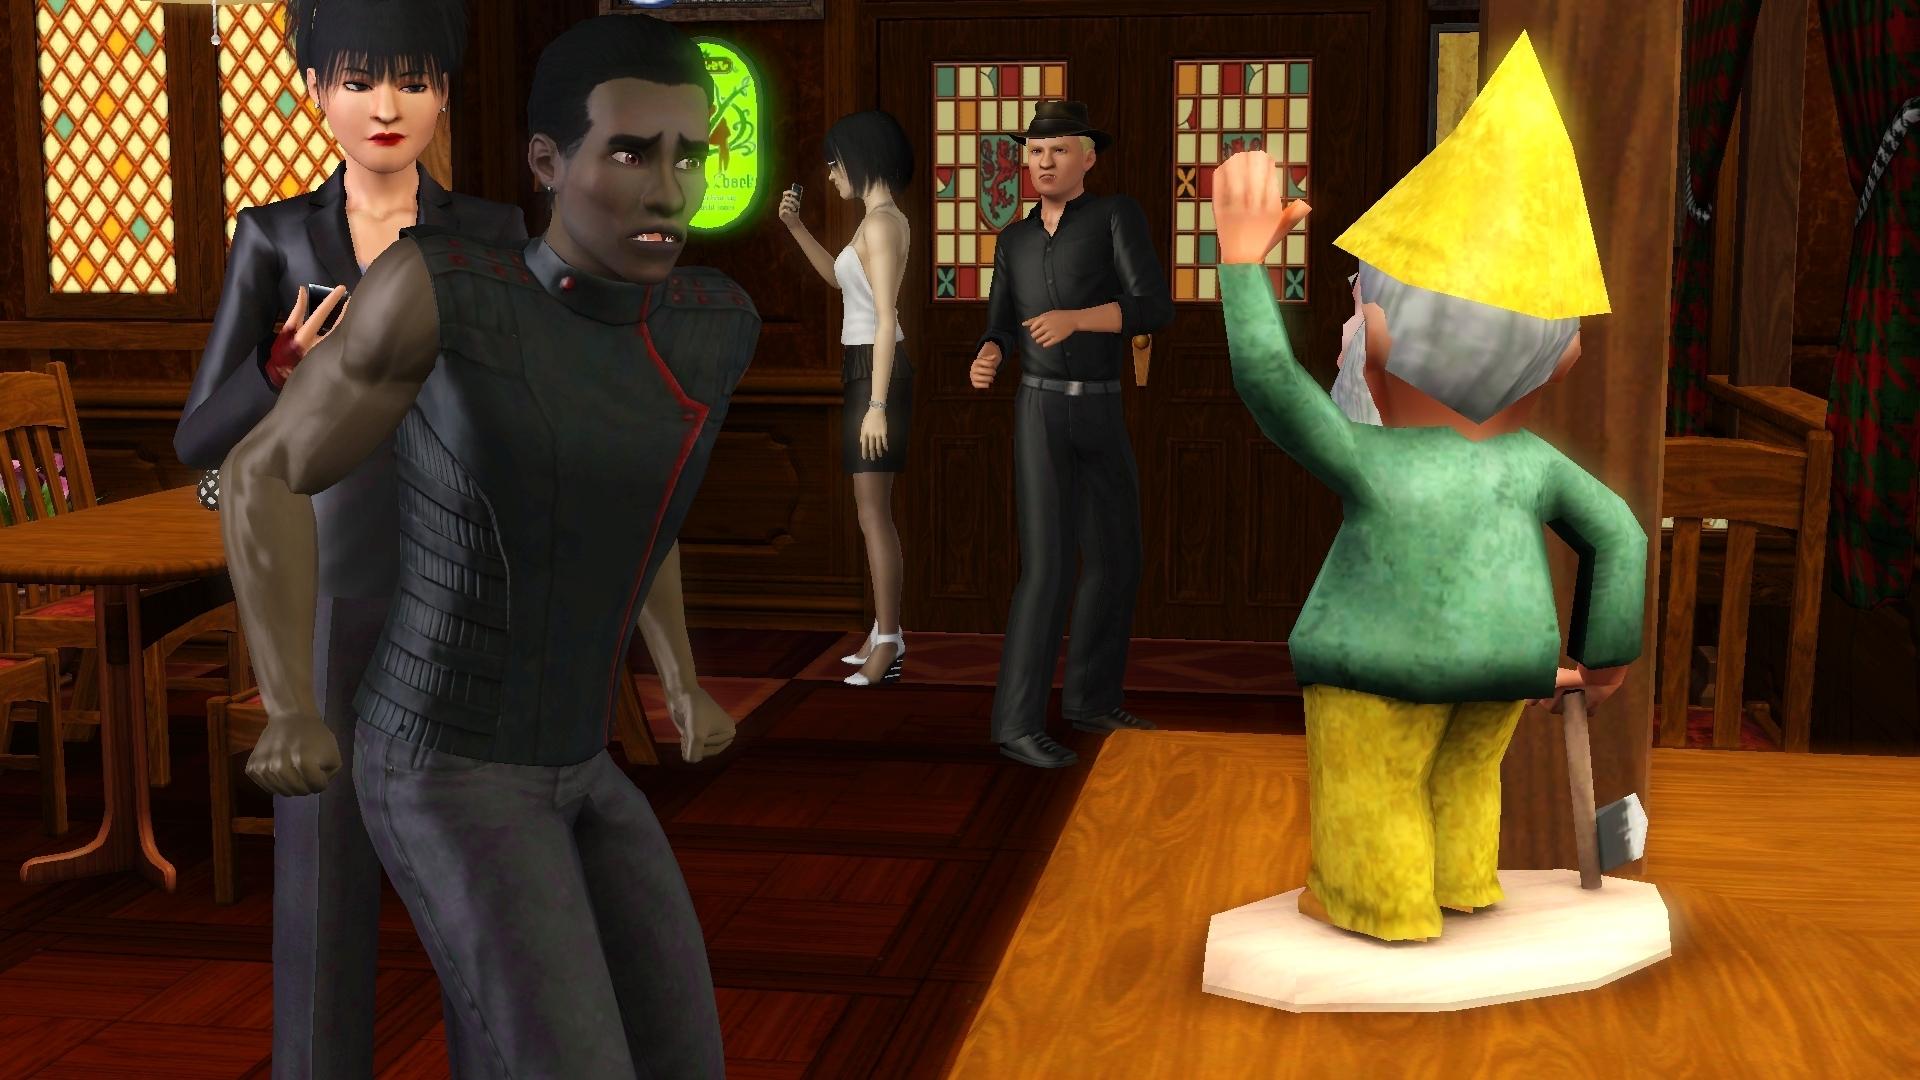 The Sims 3 Images More Random Sims 3 Screenshots Hd Wallpaper And